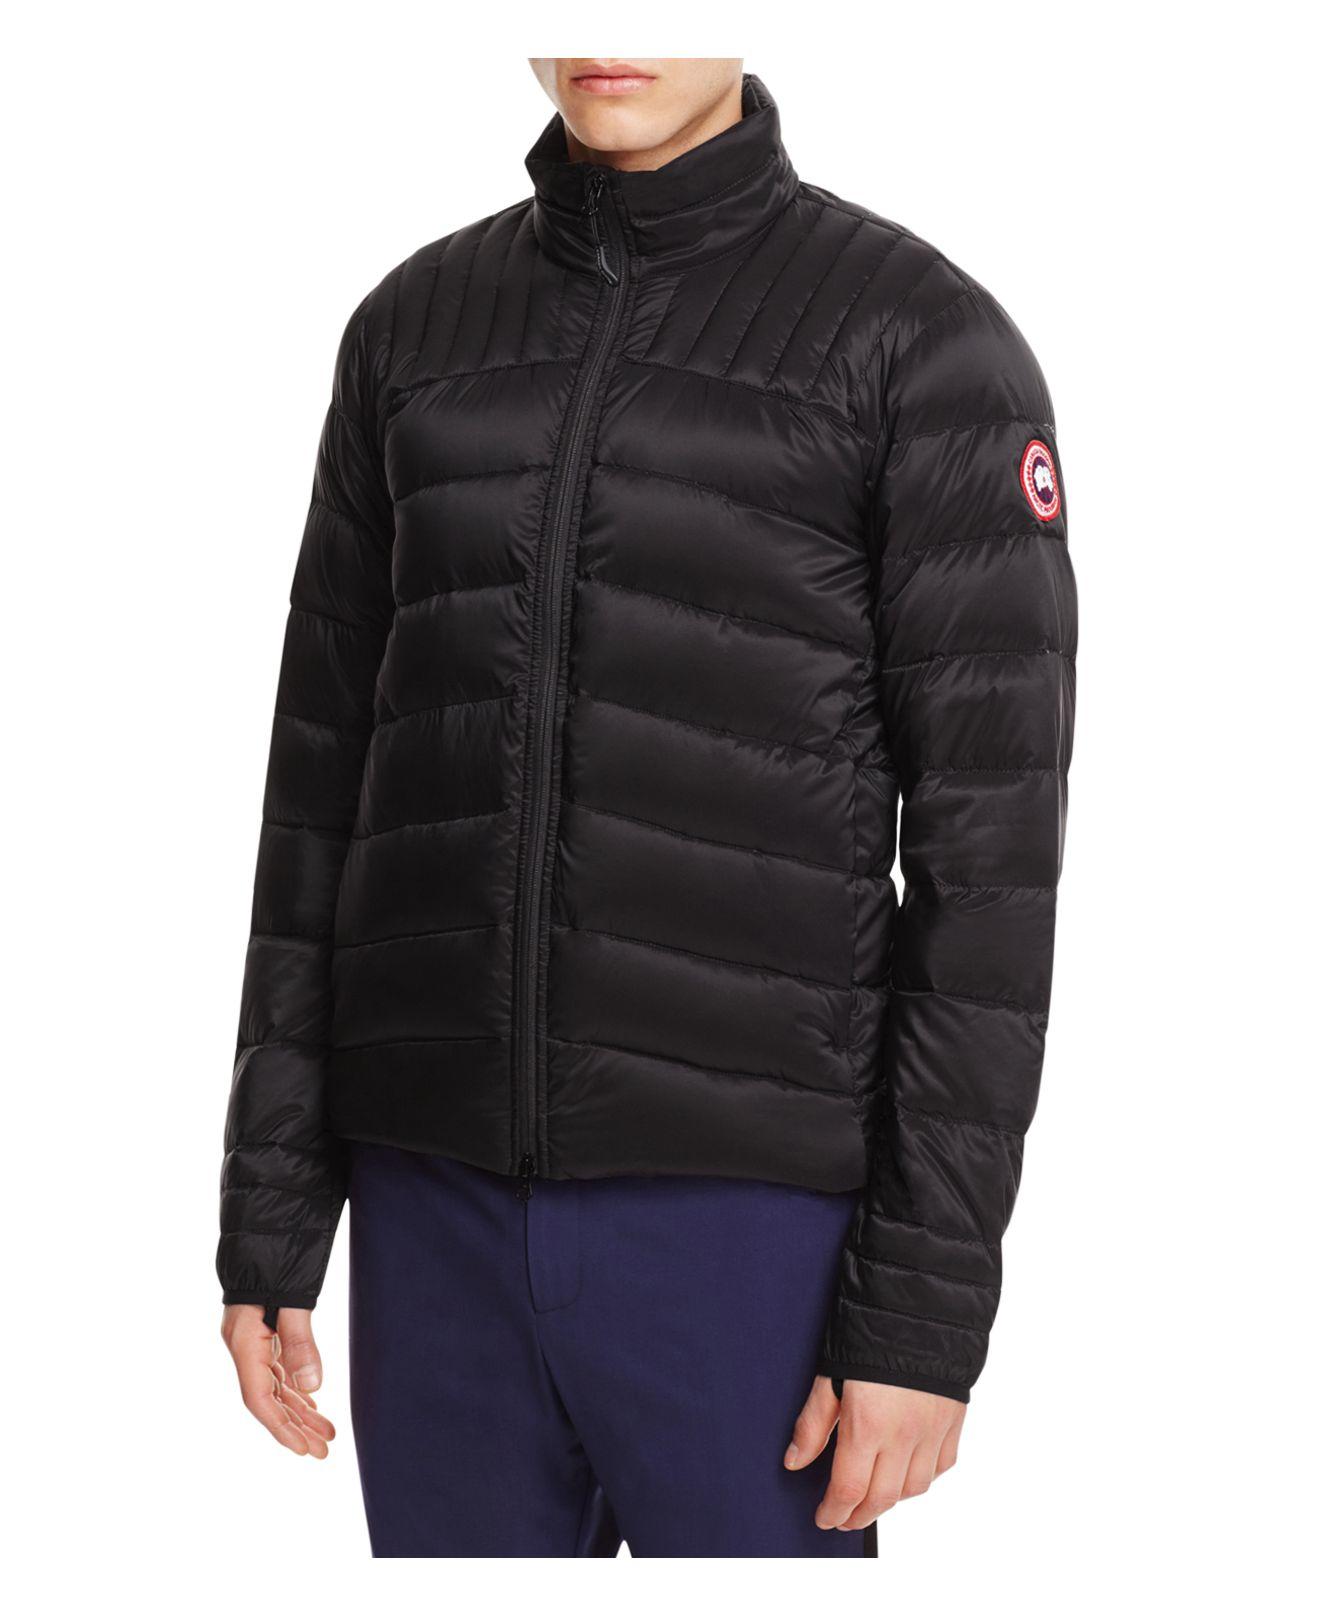 Canada Goose Brookvale Down Jacket In Black For Men Lyst